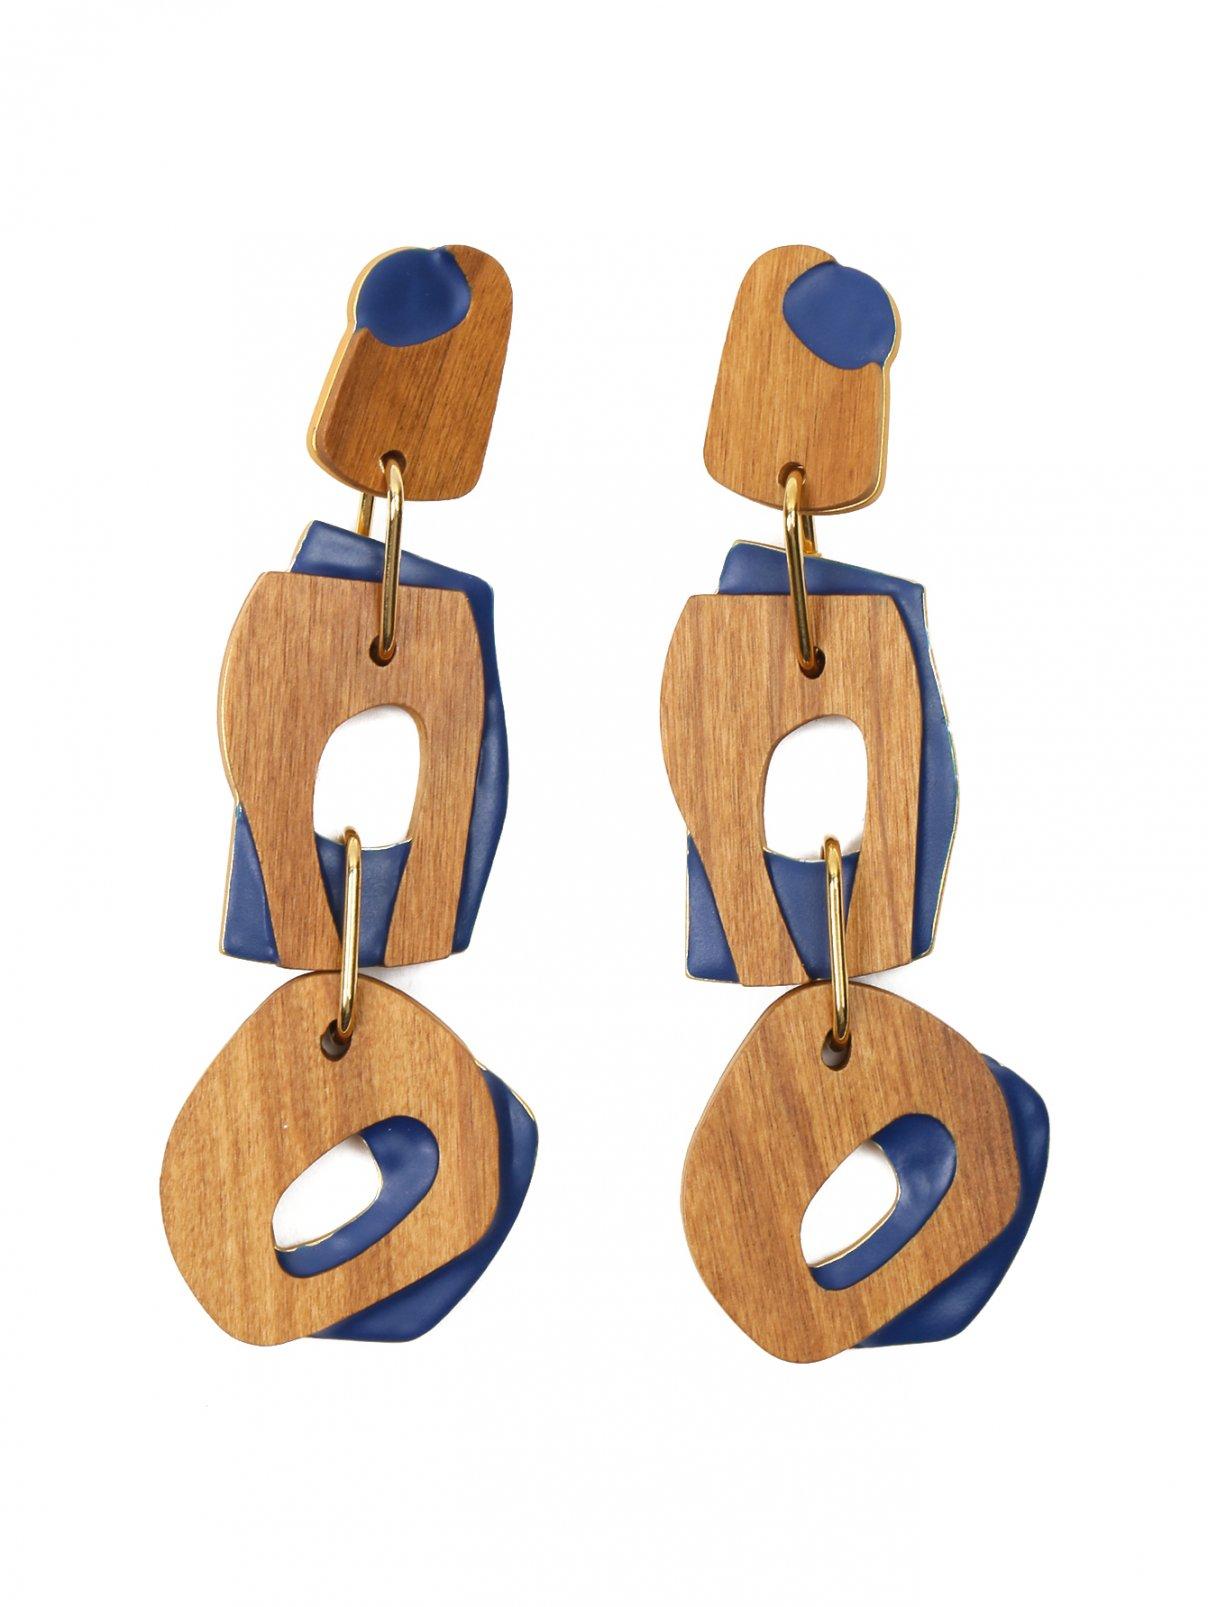 Клипсы из дерева и металла Marina Rinaldi  –  Общий вид